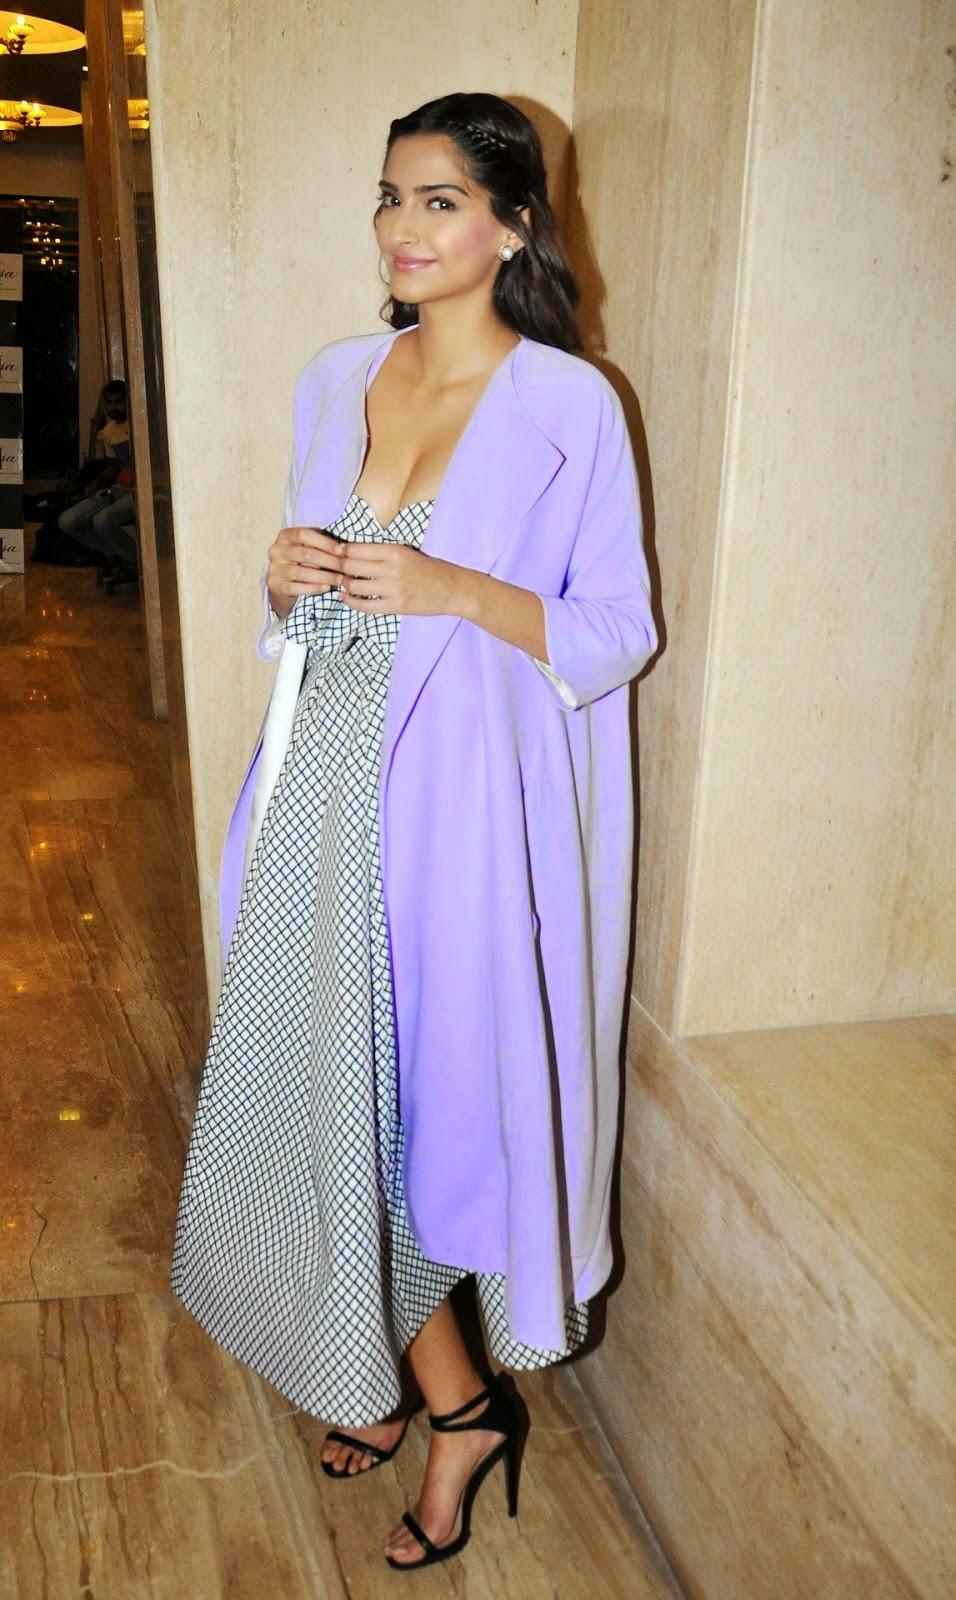 Xnxx Image Kareena Kapoor - Photo Erotica-9134